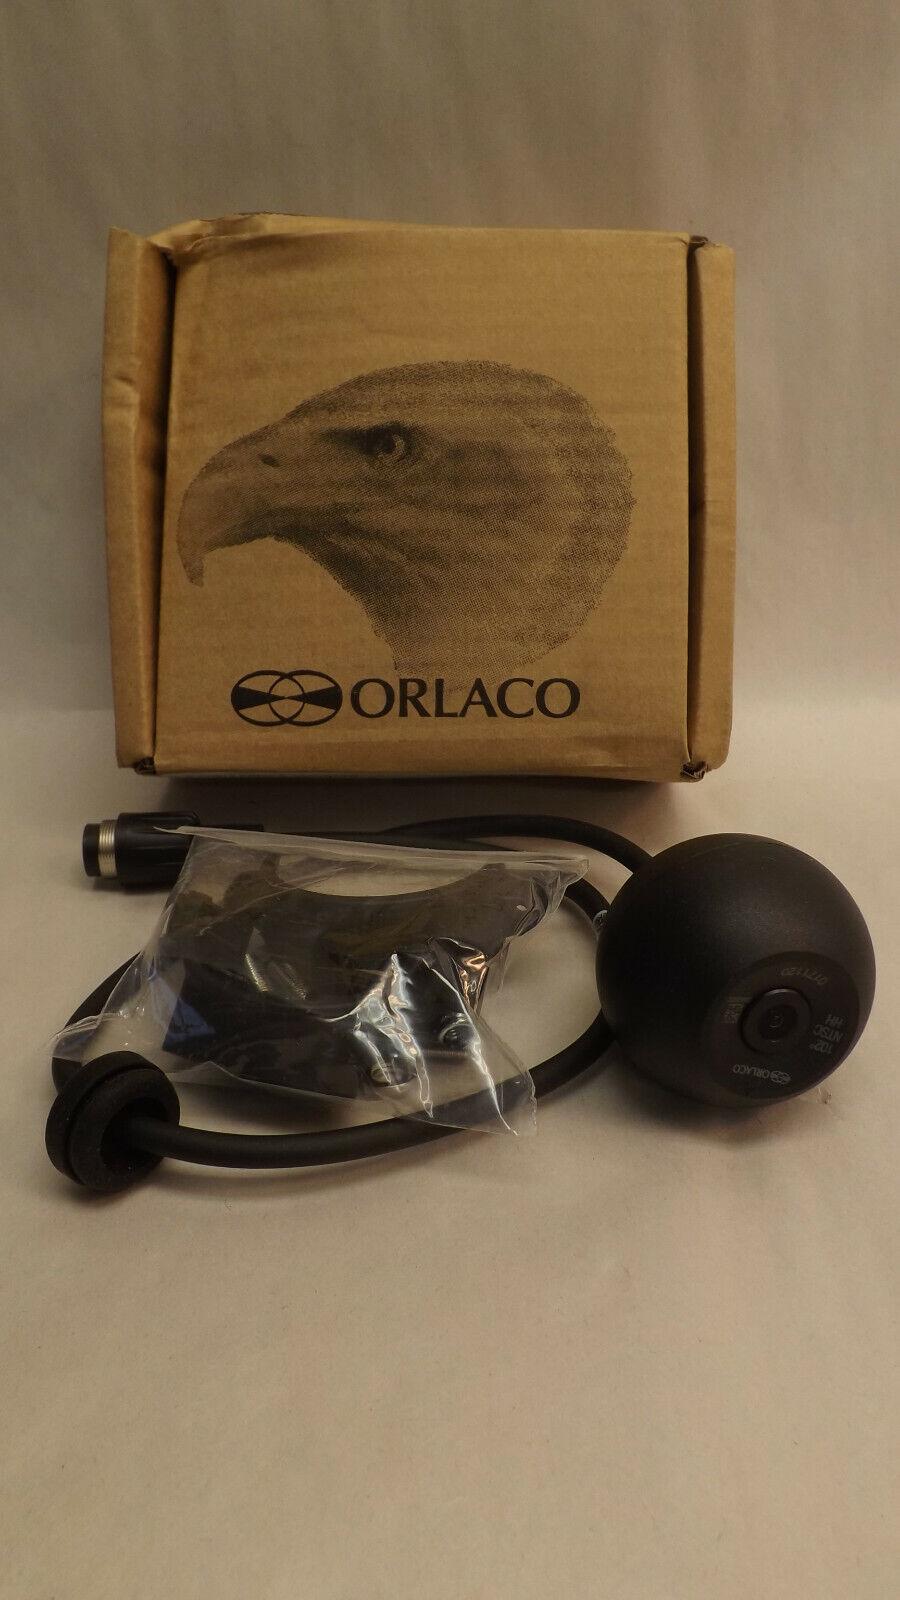 NEW Orlaco 4 pin Color Backup Camera Famos 60 degrees SLR part # 0171140